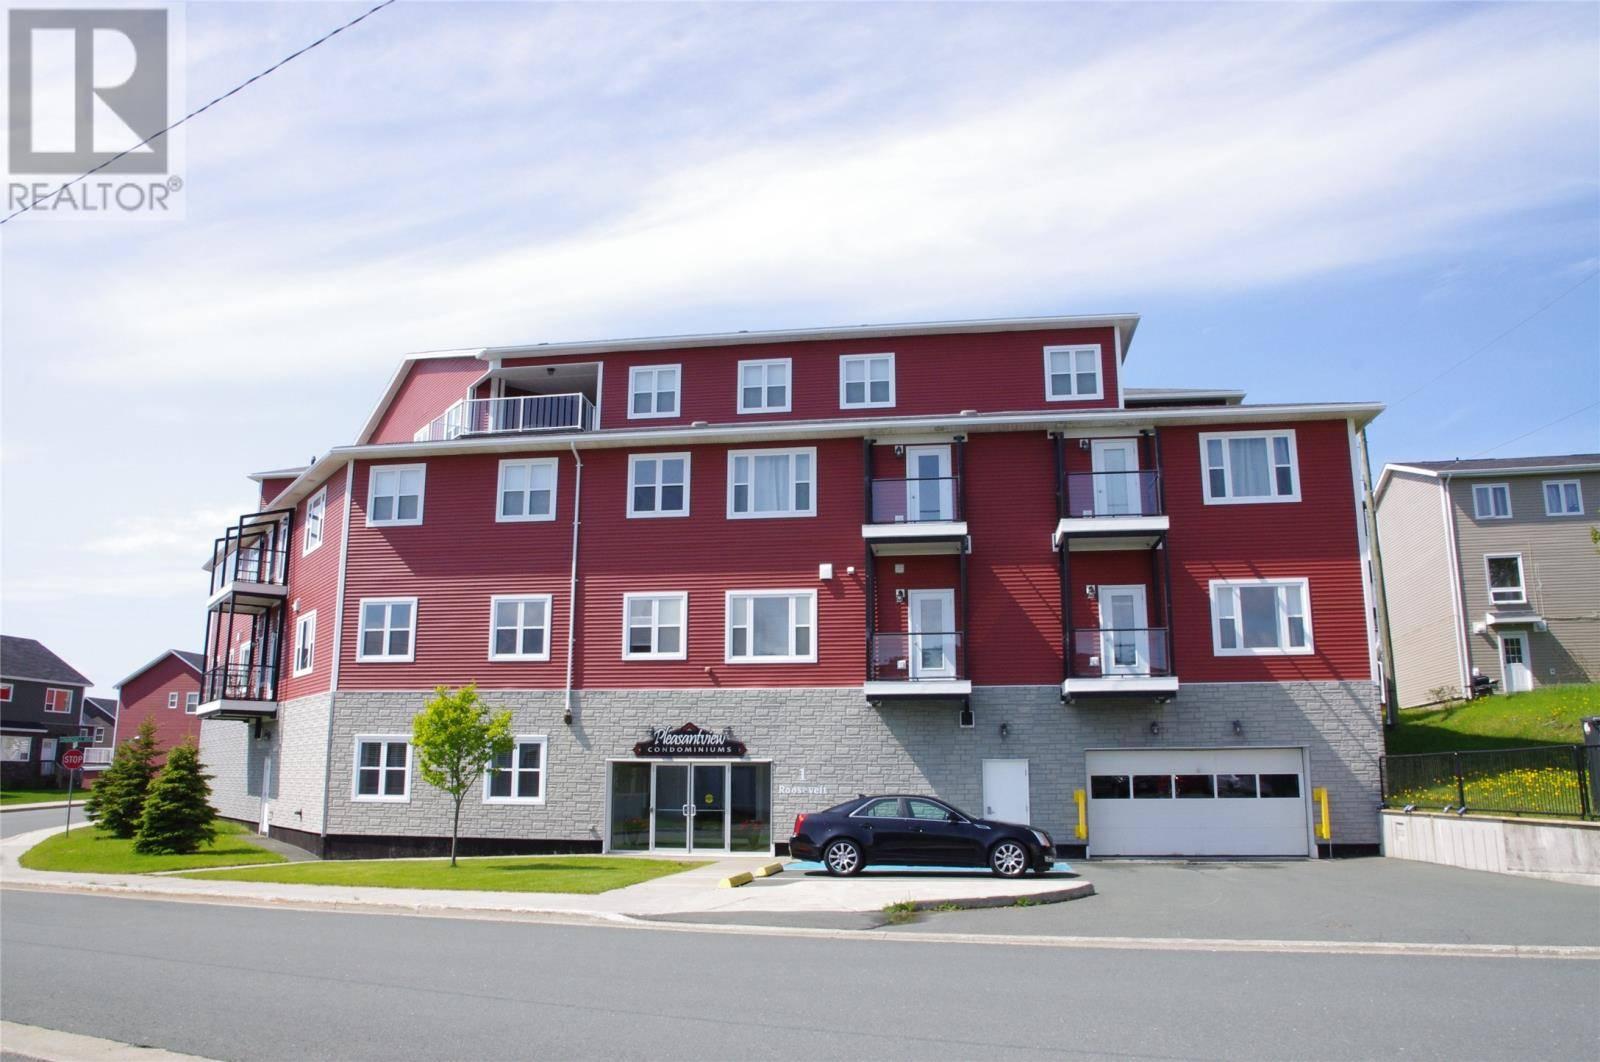 House for sale at 1 Roosevelt Ave Unit 208 St. John's Newfoundland - MLS: 1198376